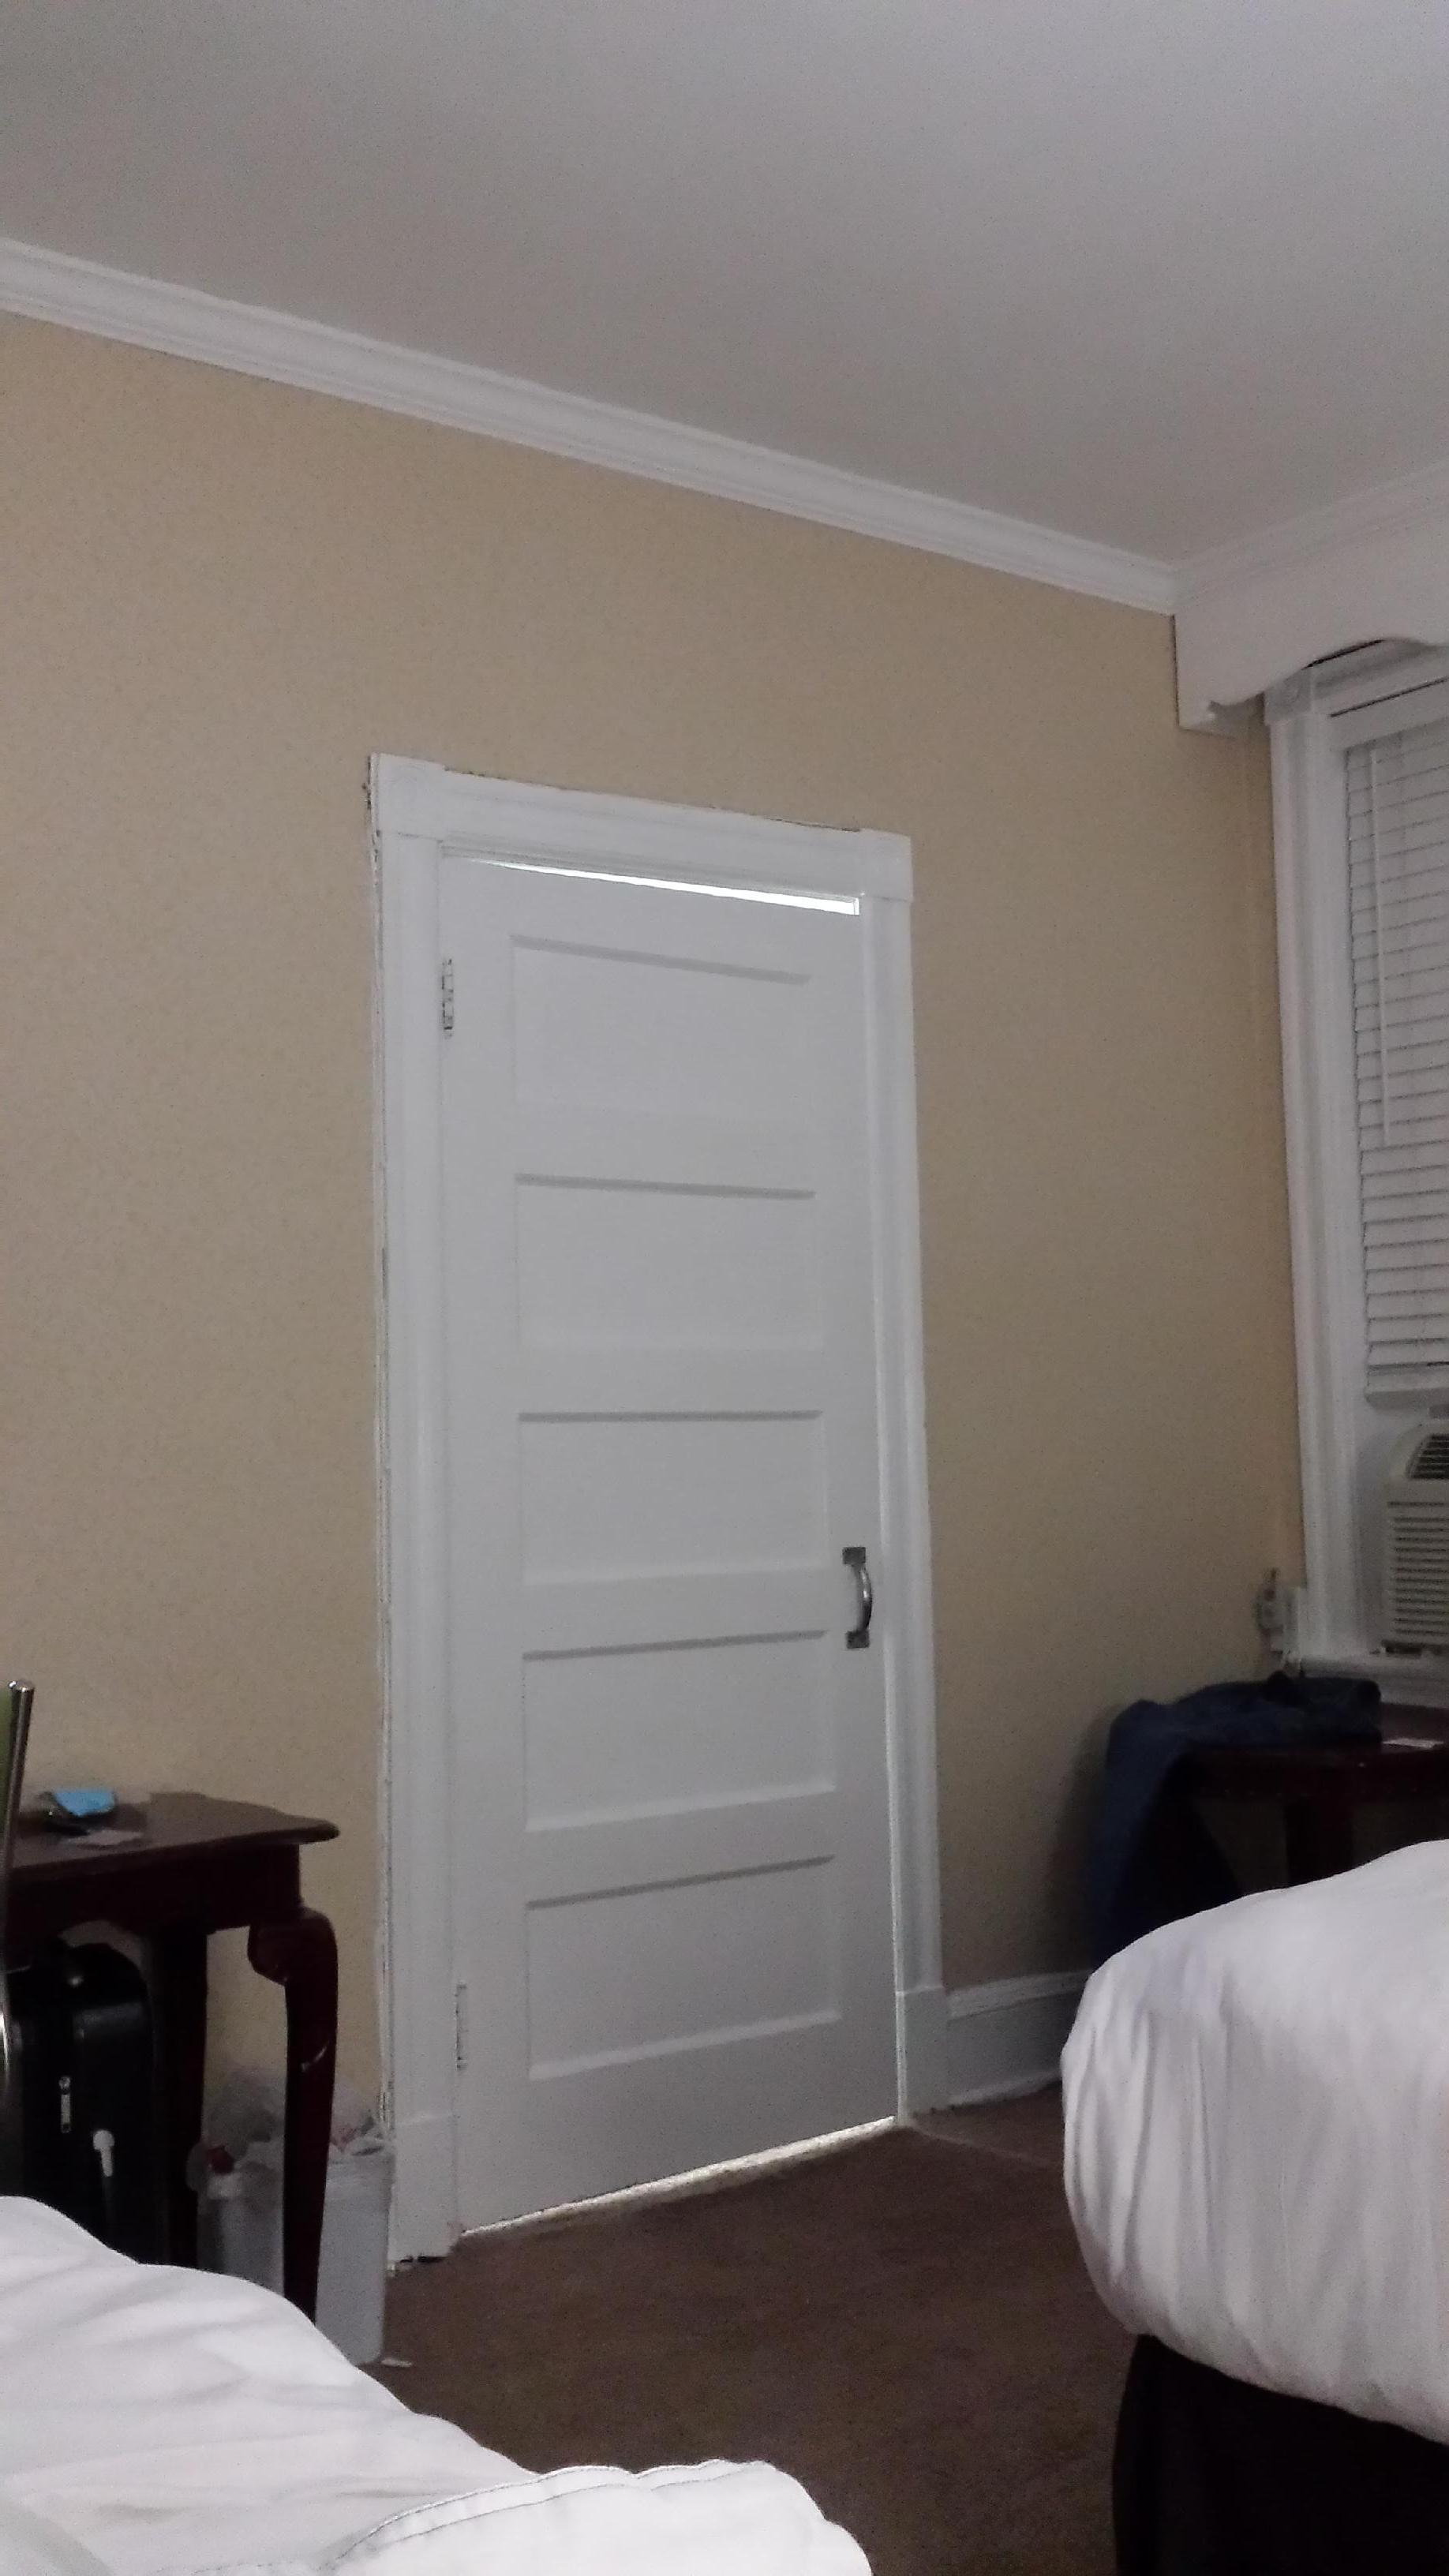 Painting, light fixture